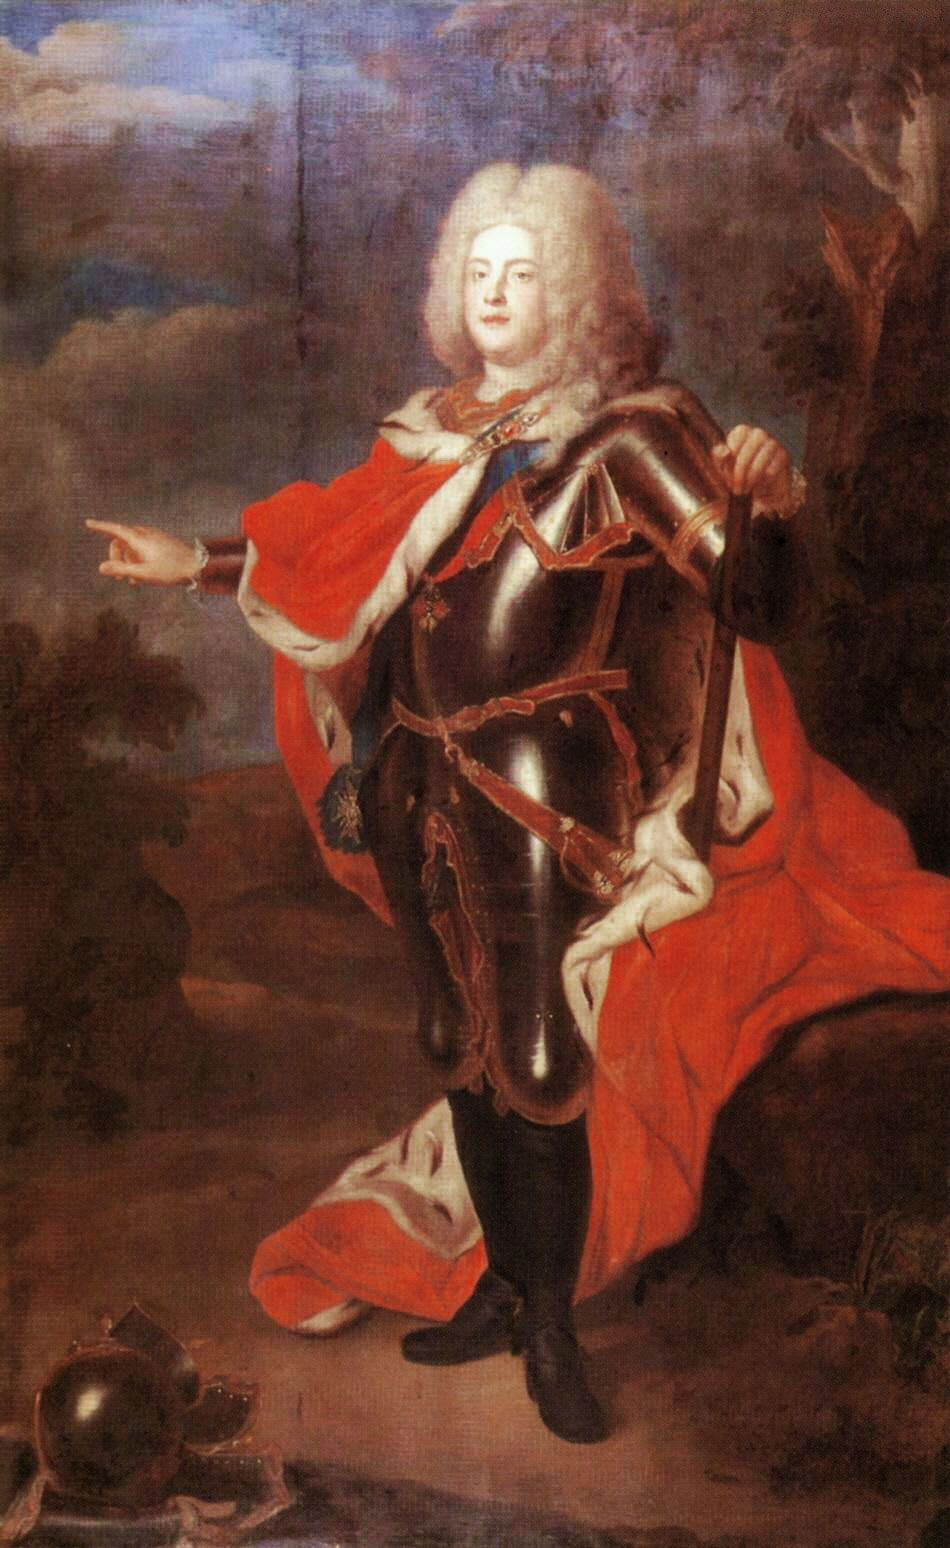 1721 August III of Saxony by Louis de Silvestre (With